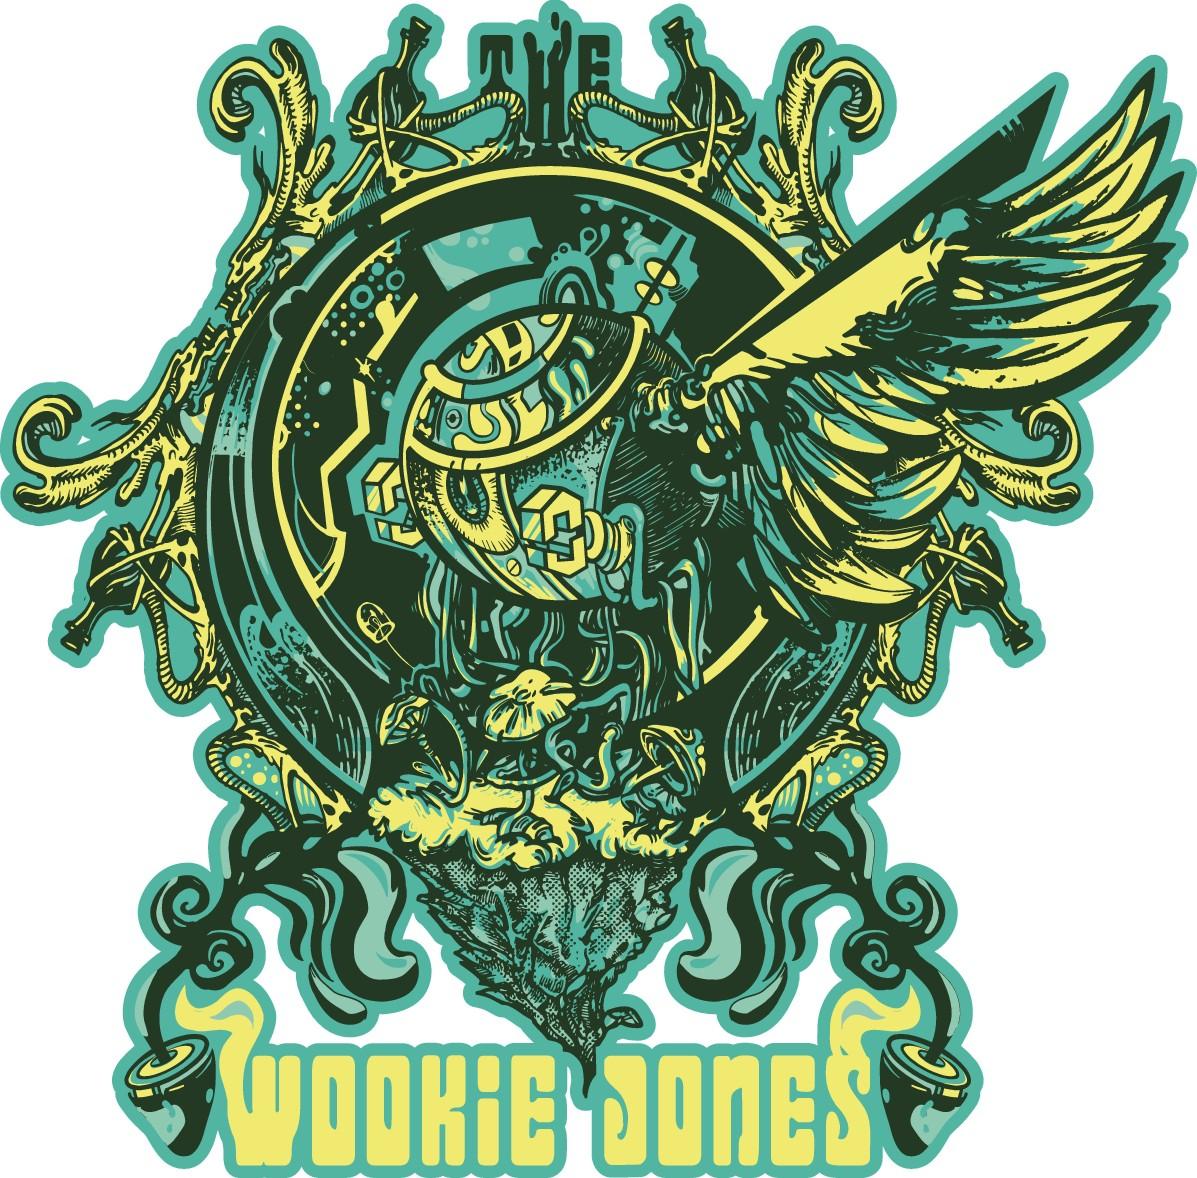 The Wookie Jones